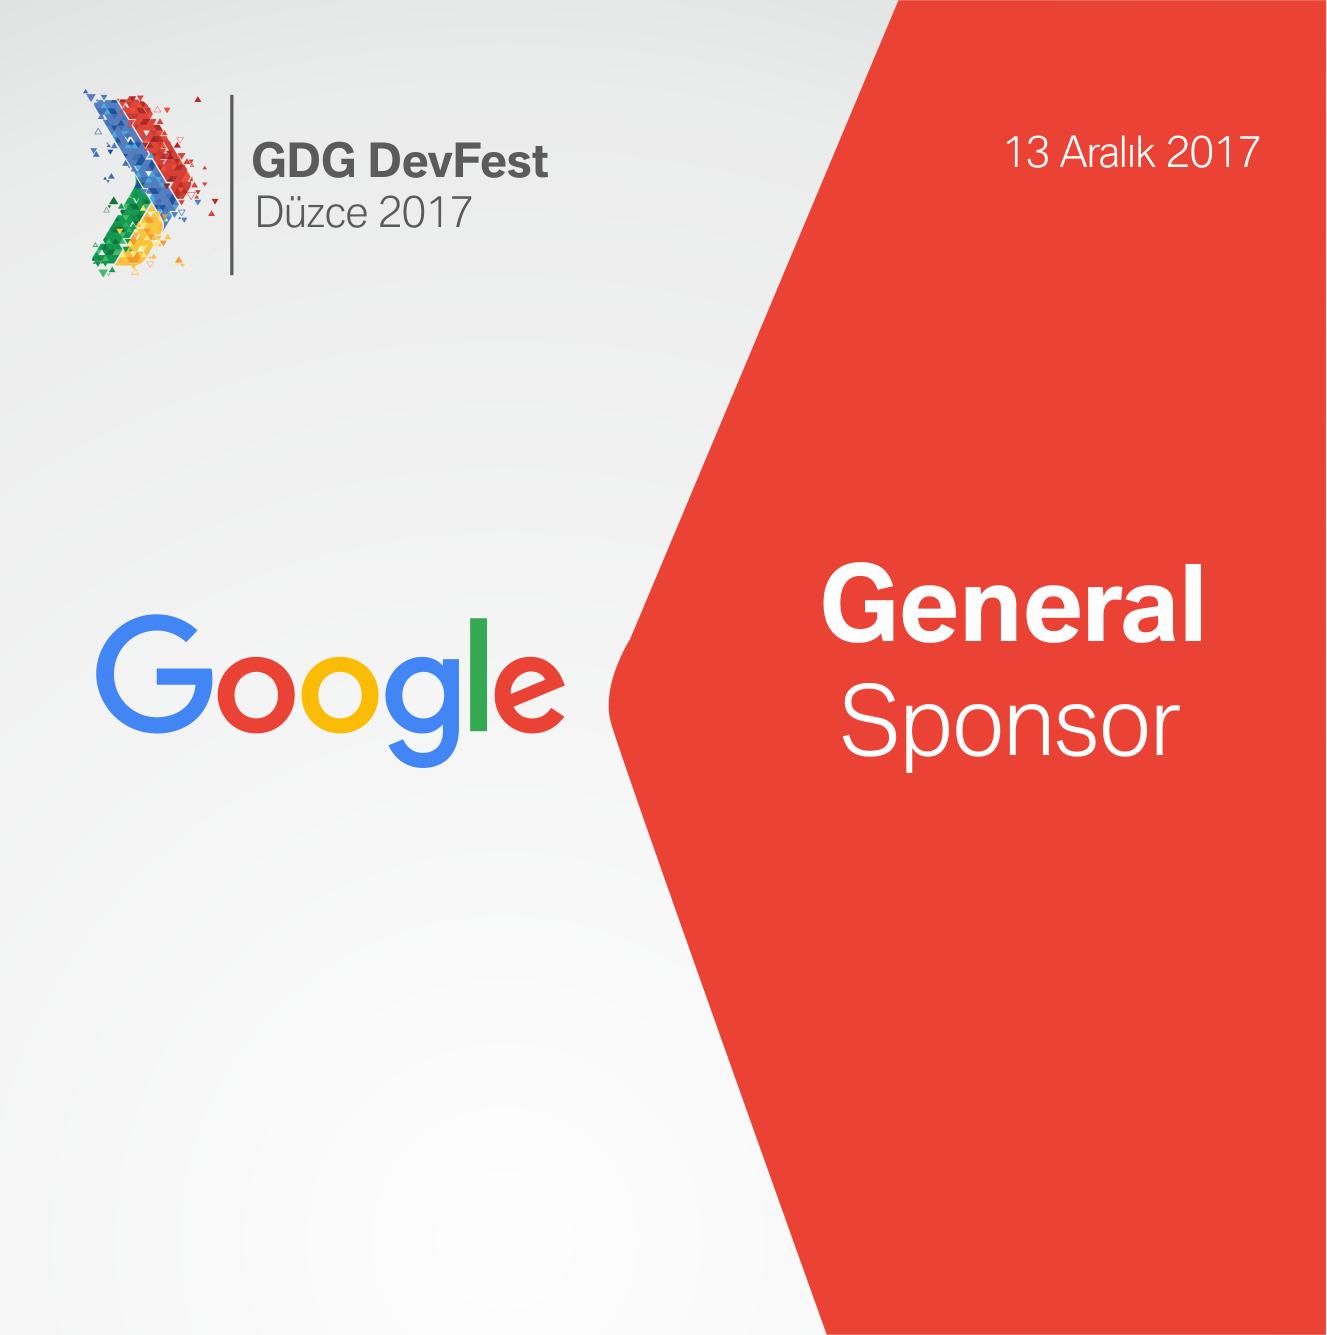 GDG DevFest Düzce 2017 General Sponsor: Google